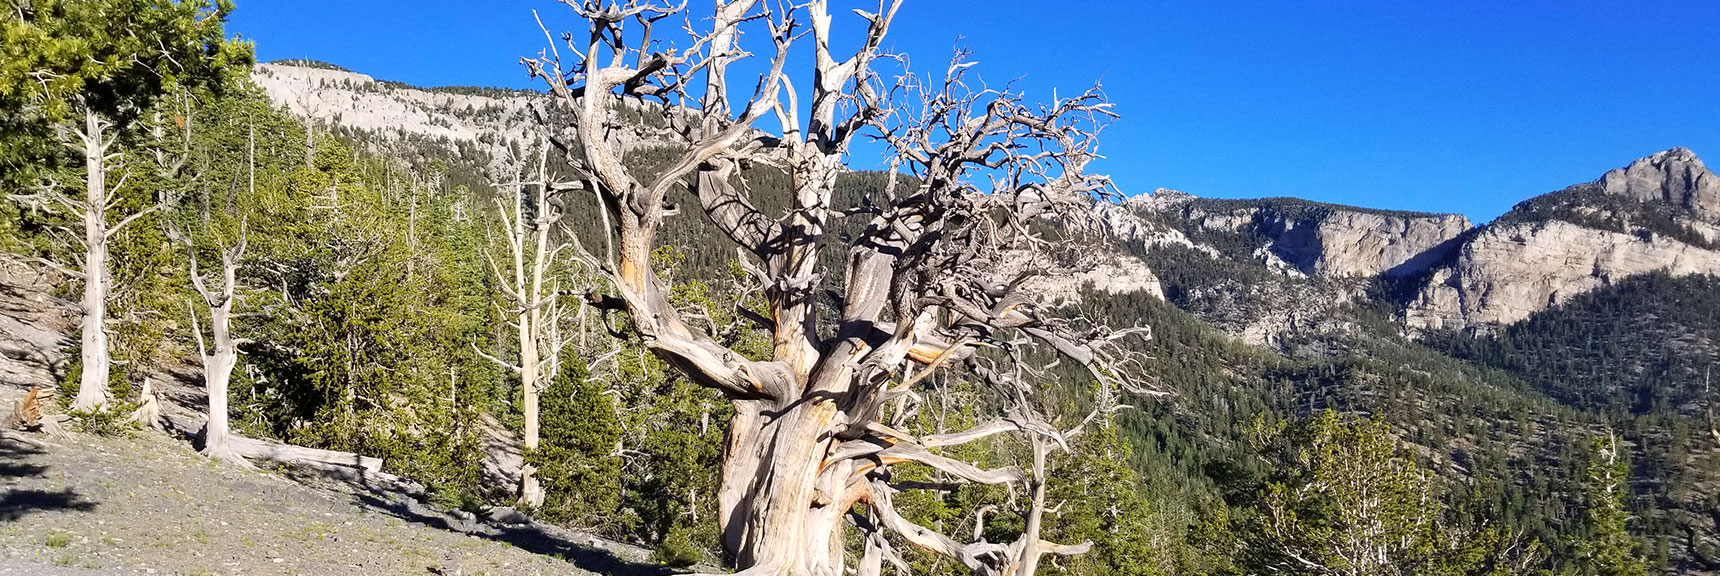 First Plateau on the North Loop Trail Toward Fletcher Peak